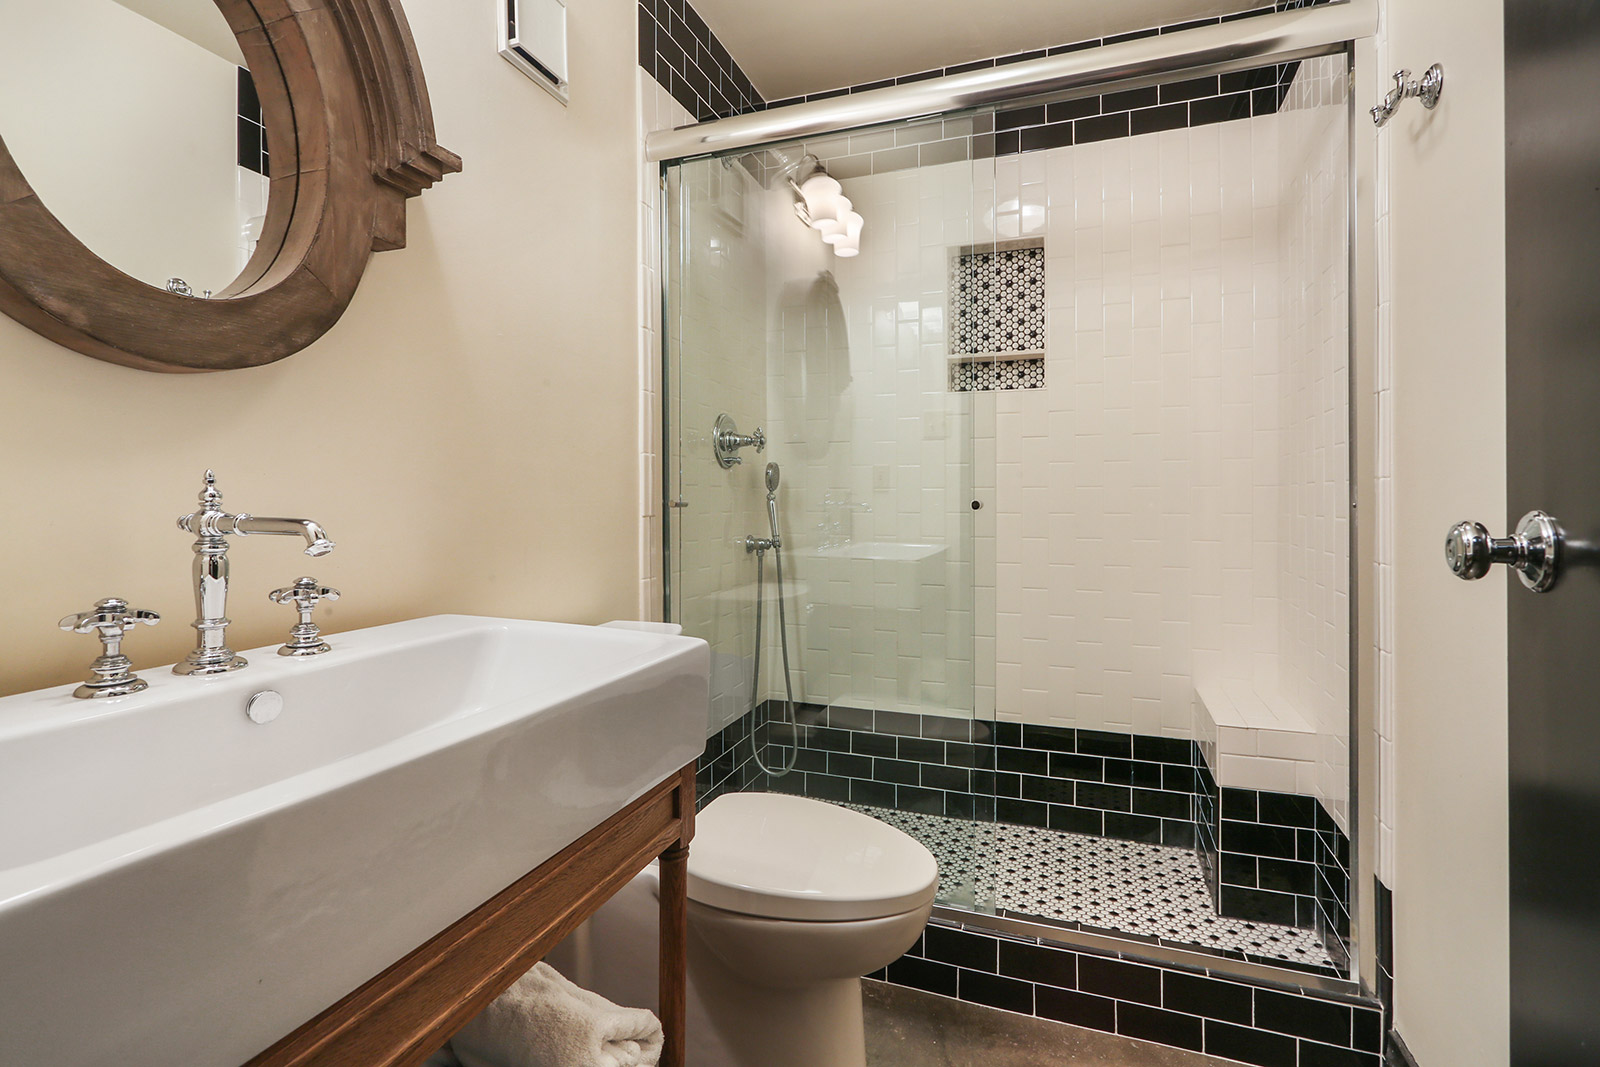 CBD/Warehouse District/South Market, Condo, 1 beds, 1.0 baths, $2400 per month New Orleans Rental - devie image_5